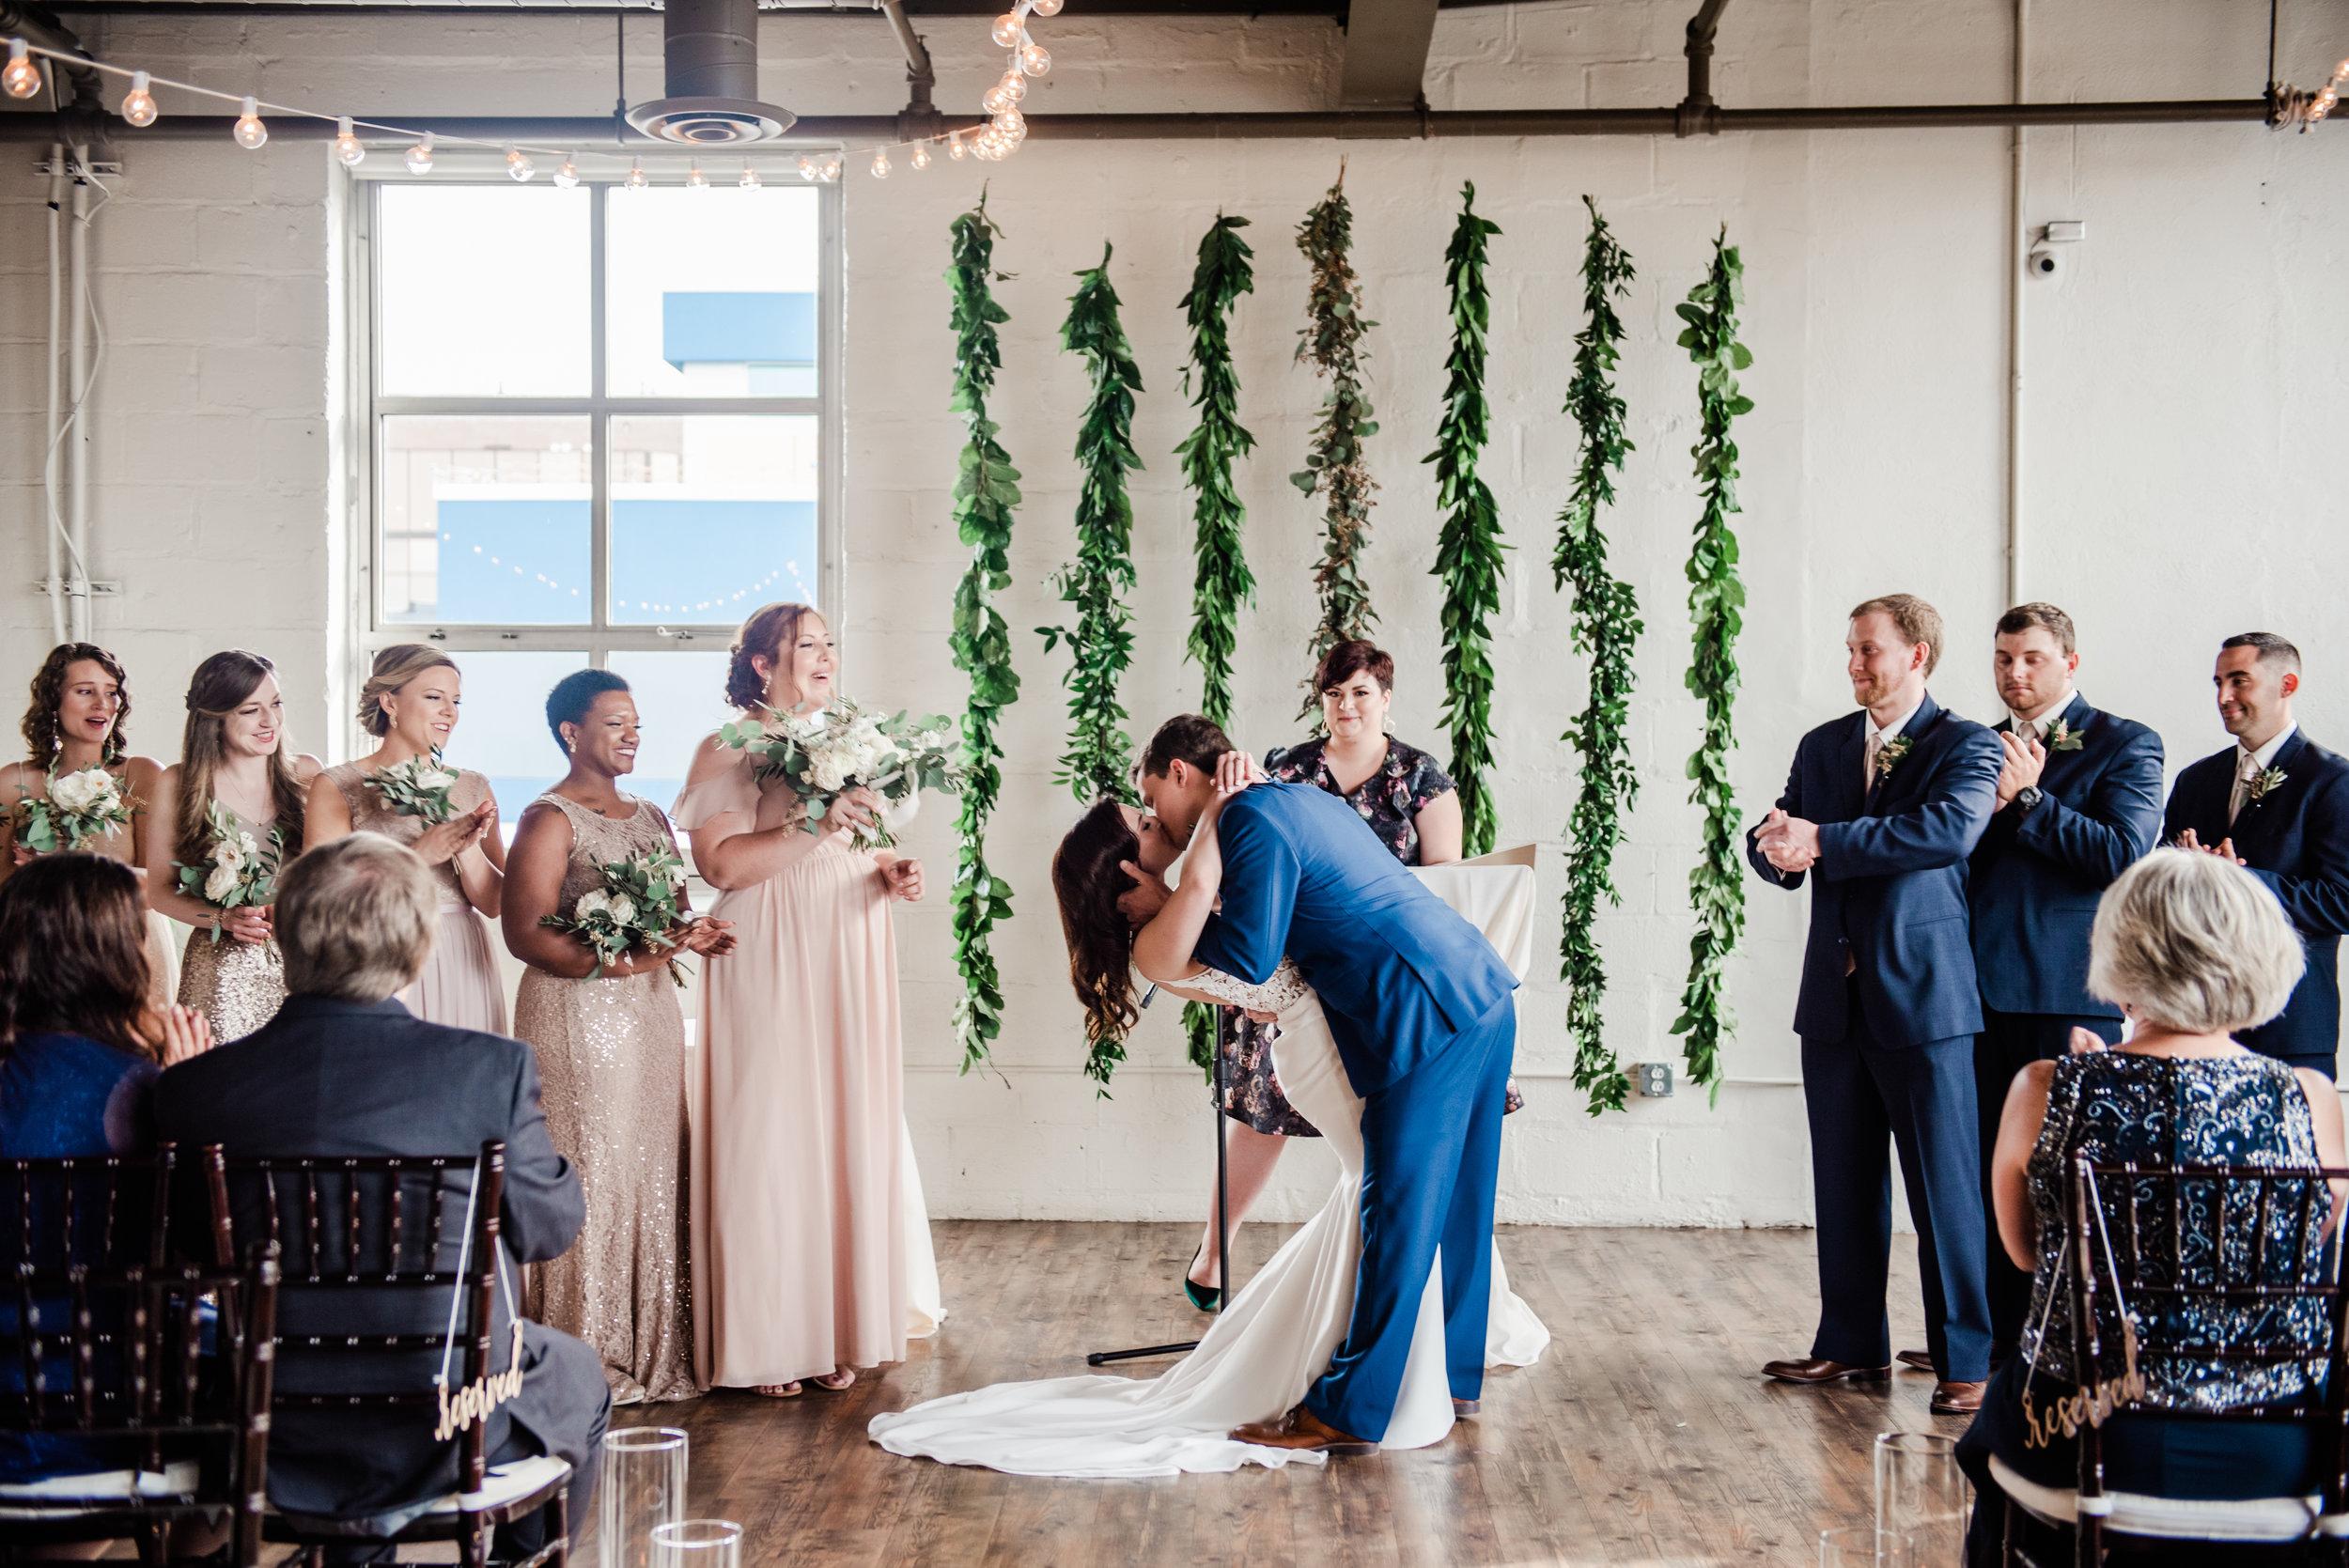 The_Arbor_Loft_Rochester_Wedding_JILL_STUDIO_Rochester_NY_Photographer_171656.jpg